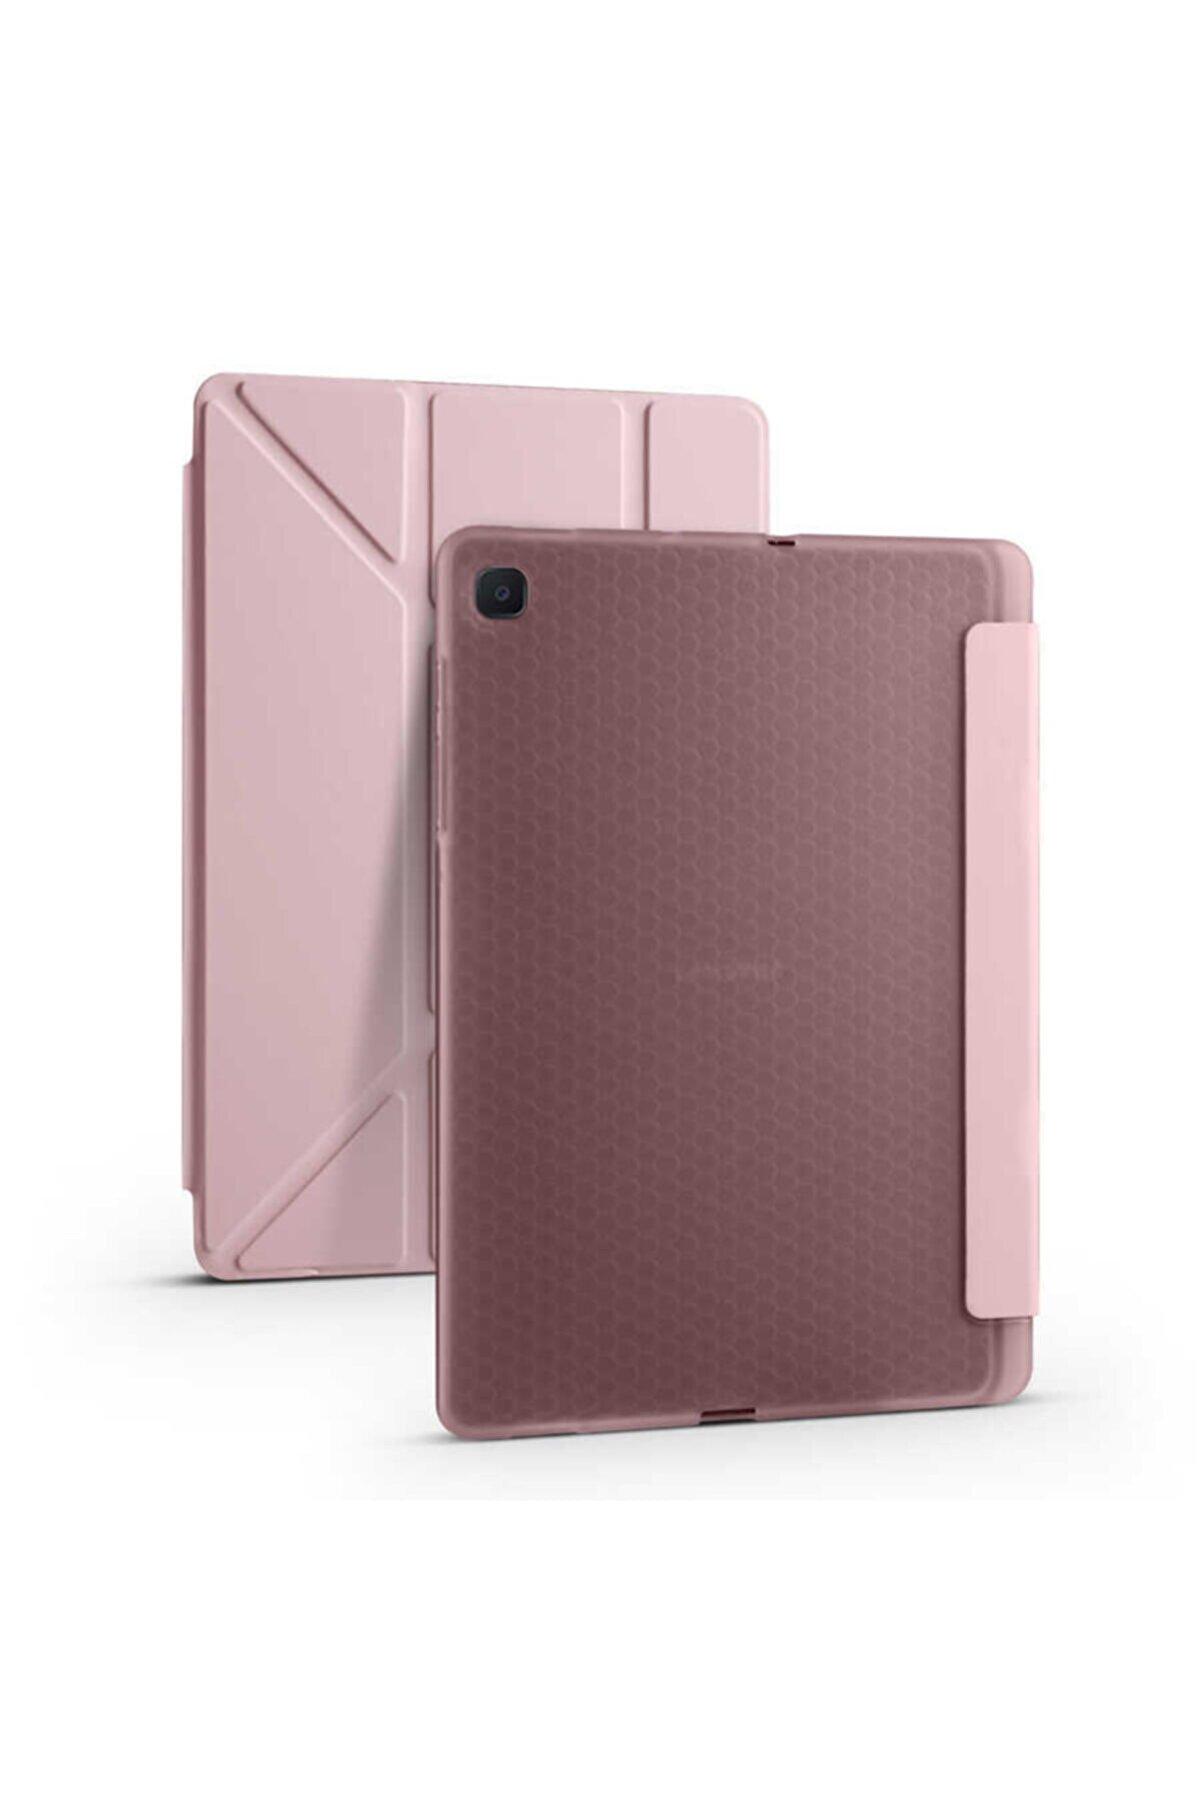 Samsung Cprimetation Galaxy Tab S6 Lite P610 Kılıf Tri Folding Smart Ceper Standlı Kalemlikli